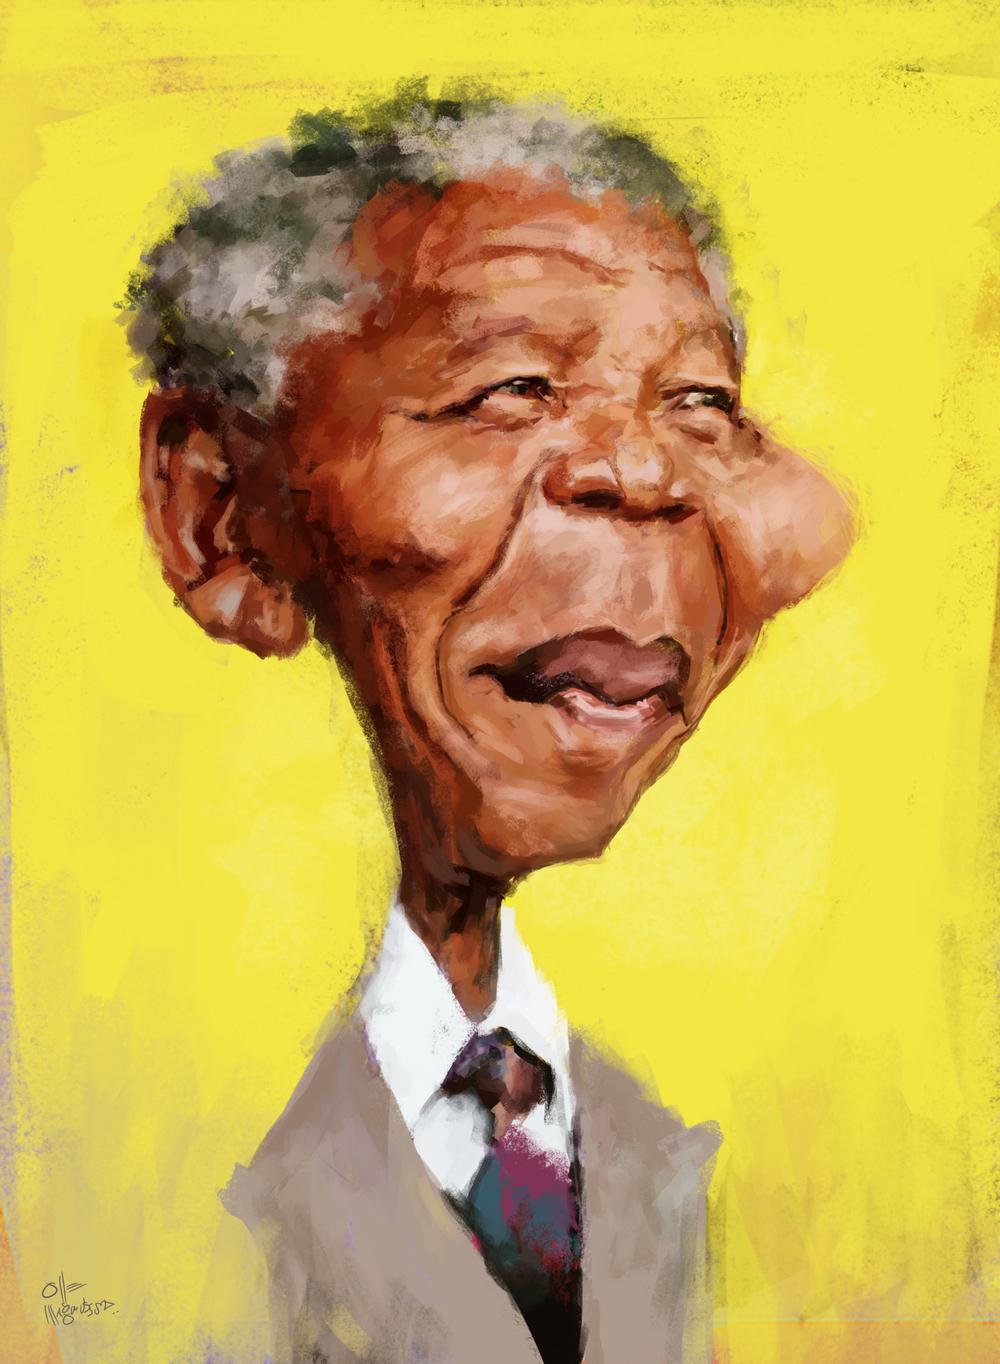 a005899e99_Nelson_Mandela_caricature.jpg